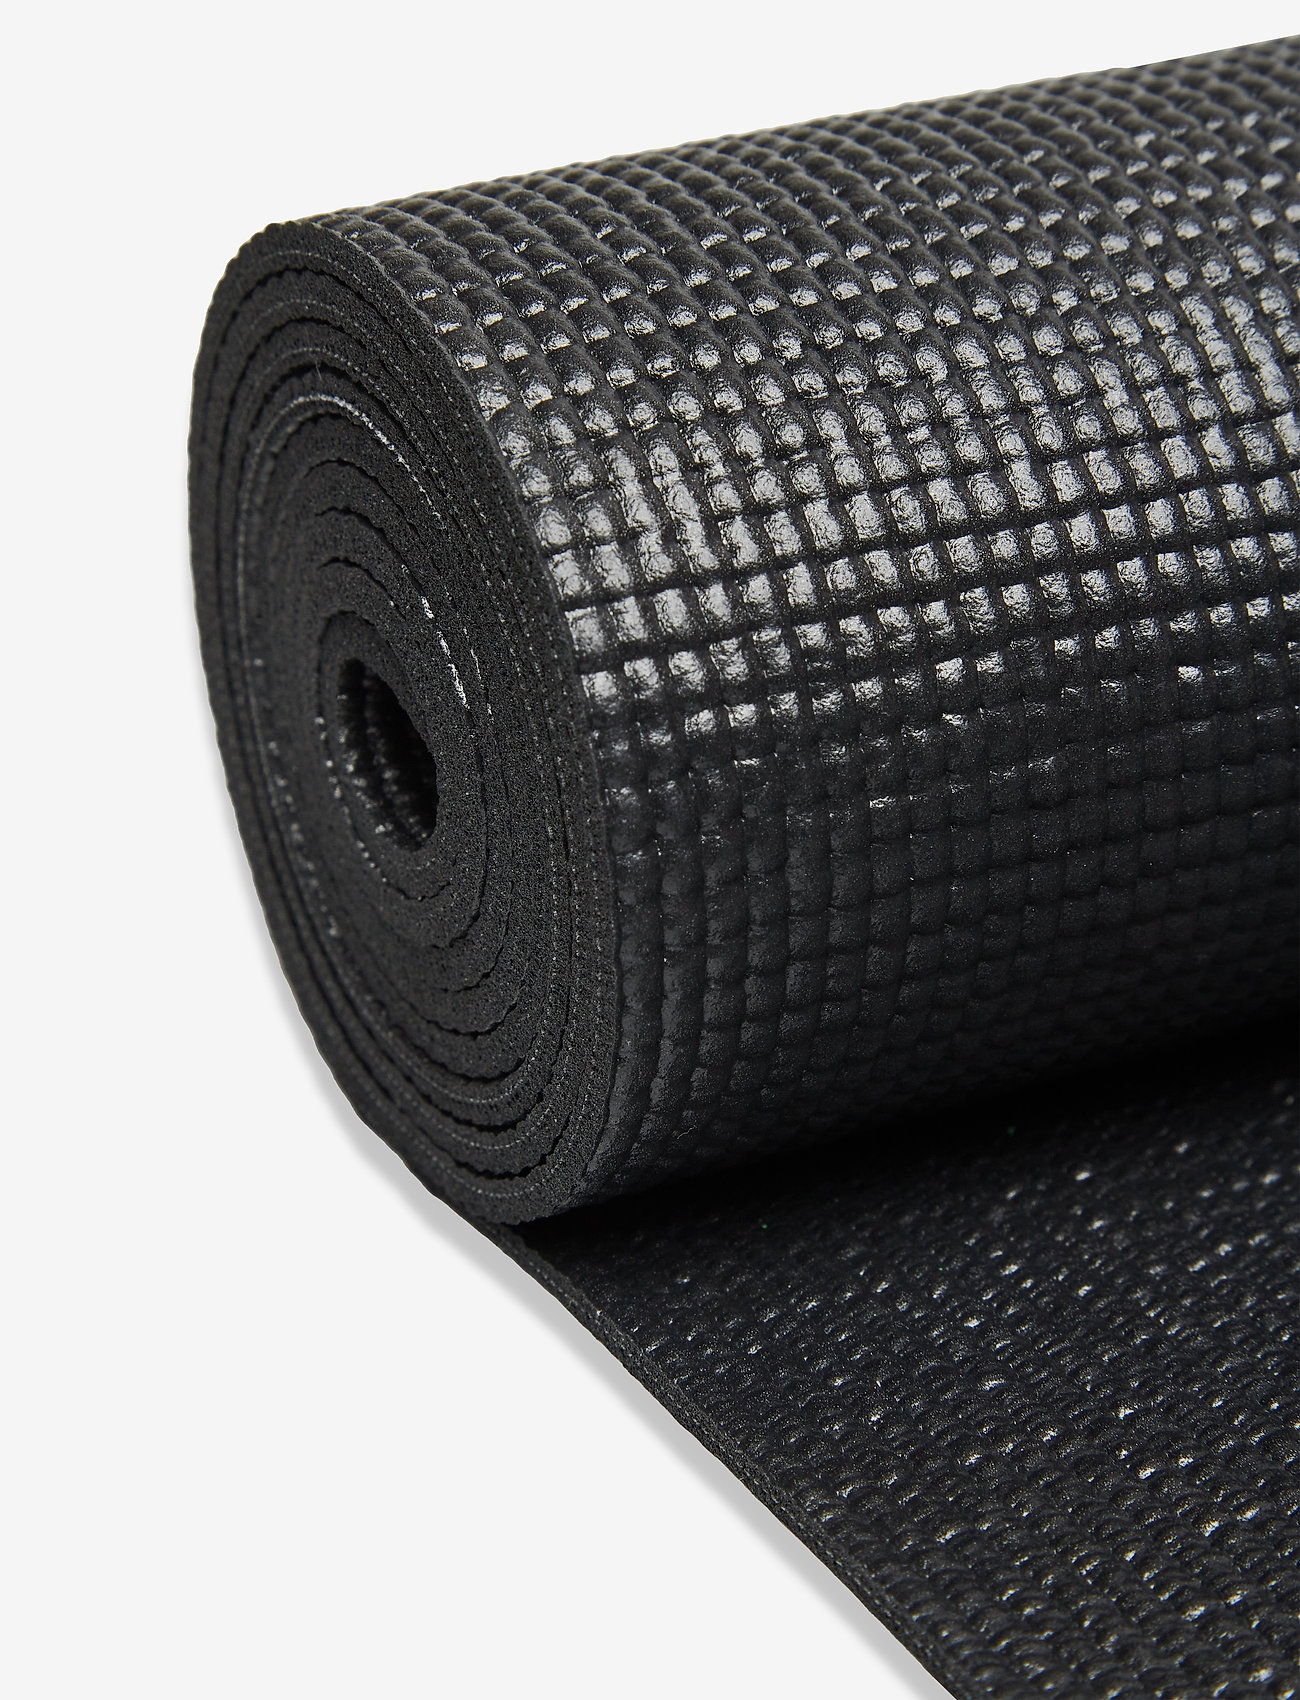 Yogiraj - All-round yoga mat 4 mm - Yogiraj - yogamatten en -accessoires - midnight black - 1